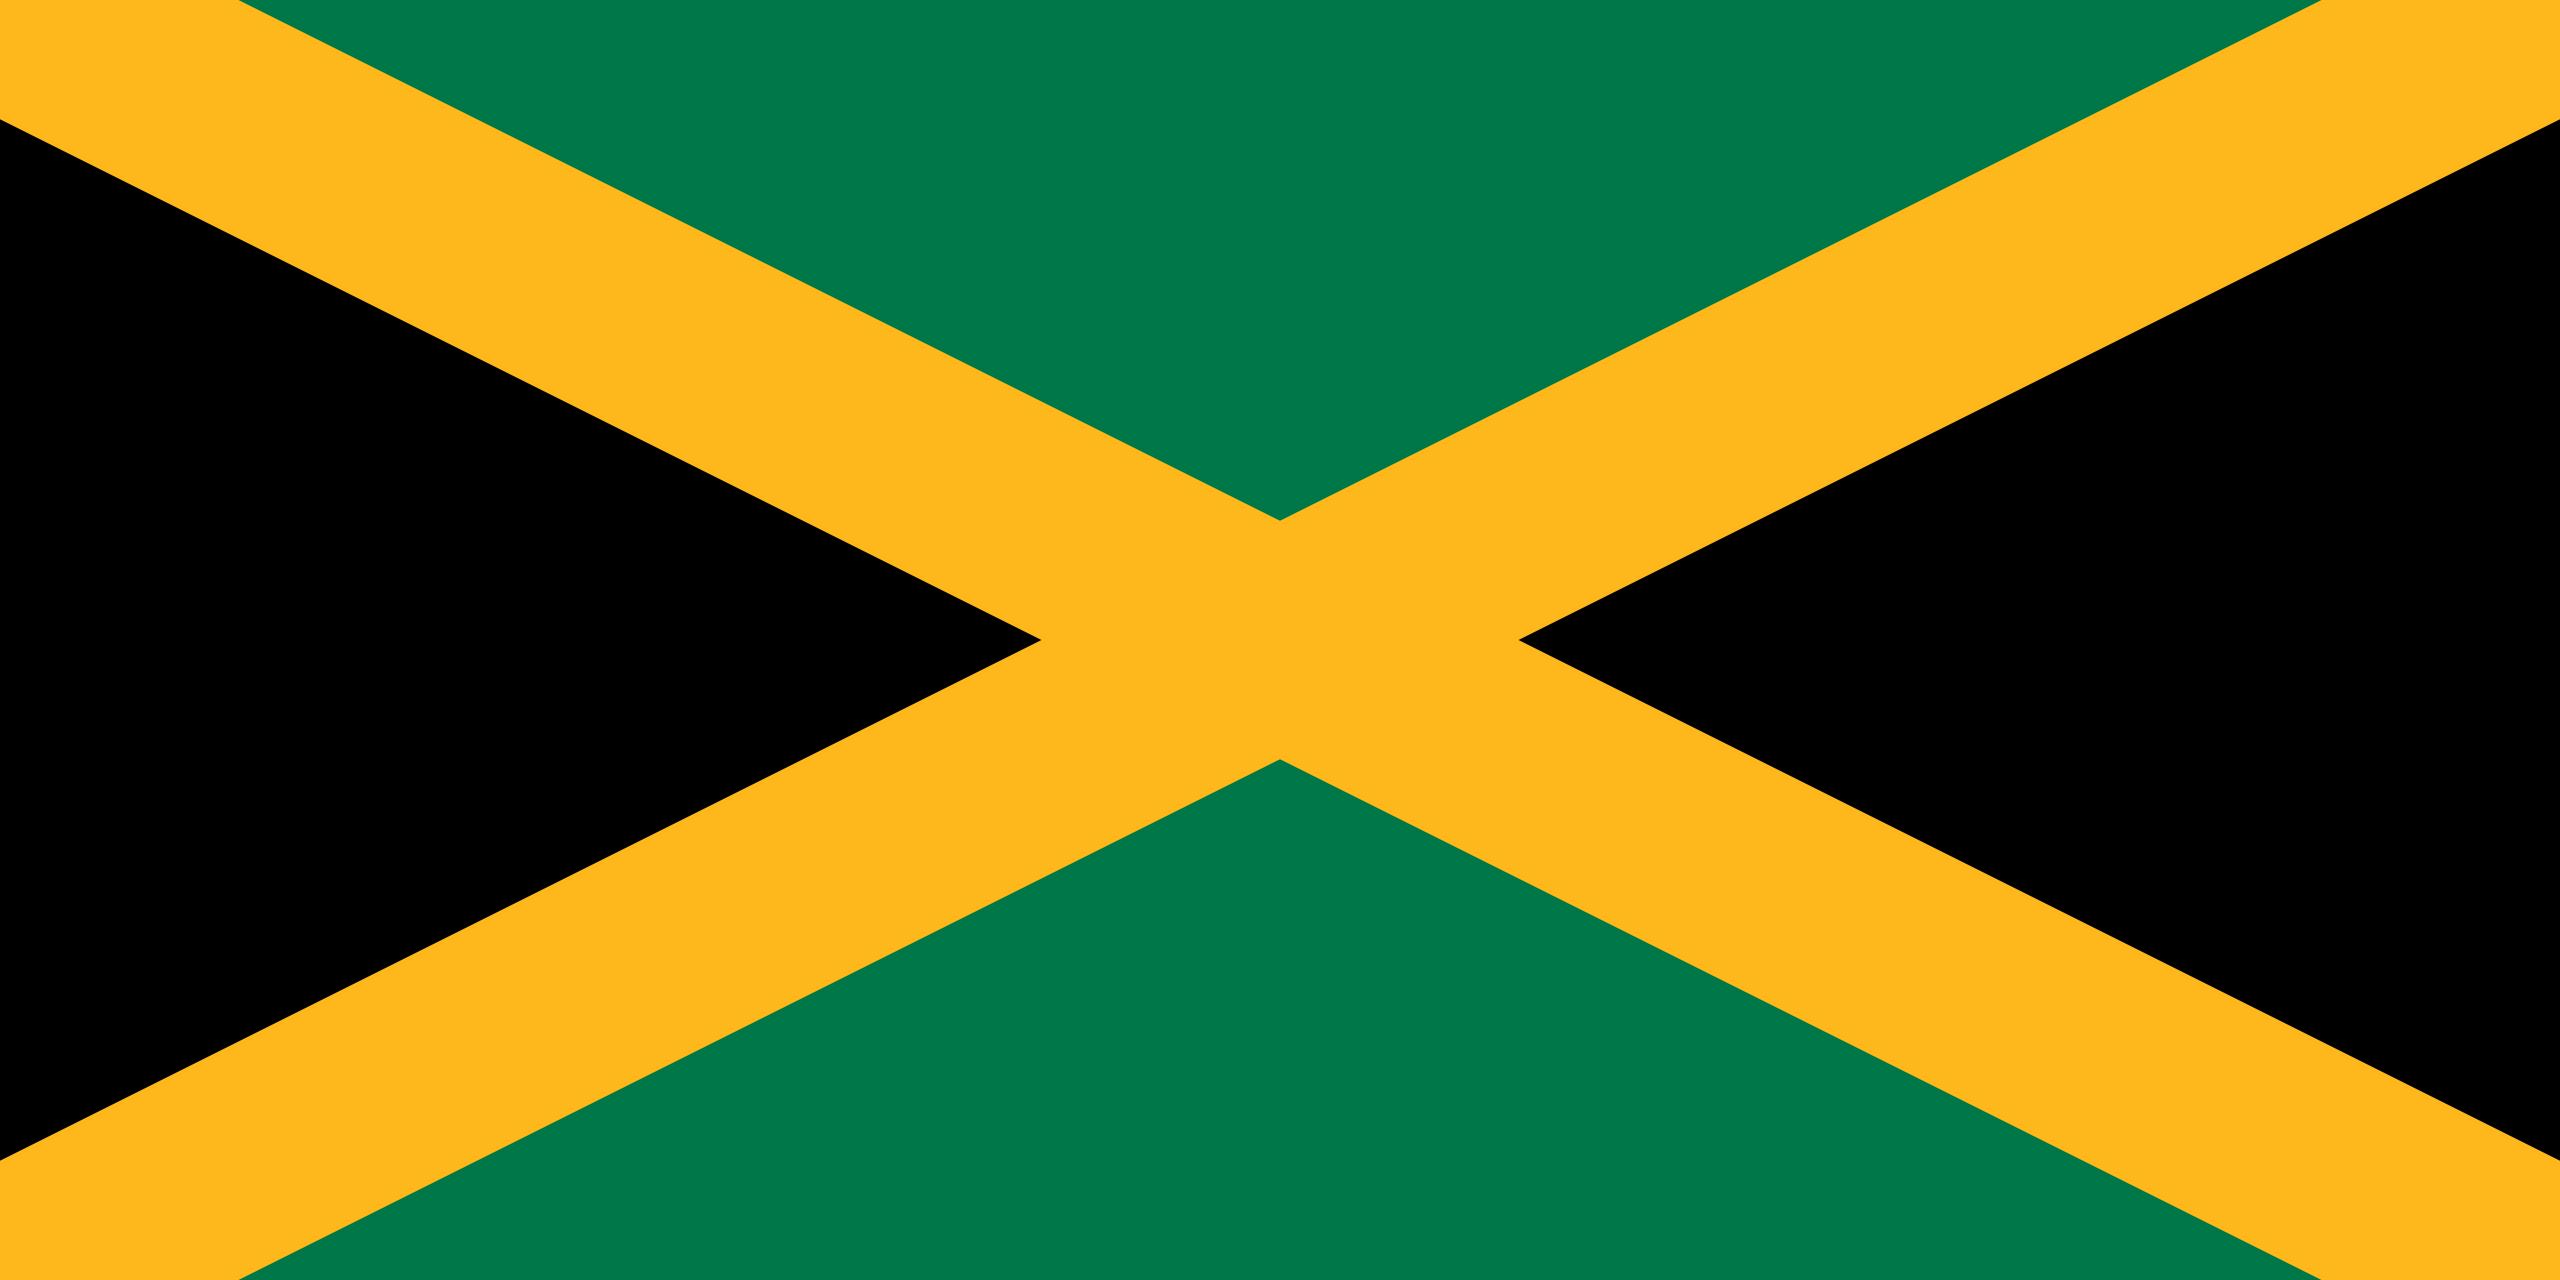 флаг ямайки картинки